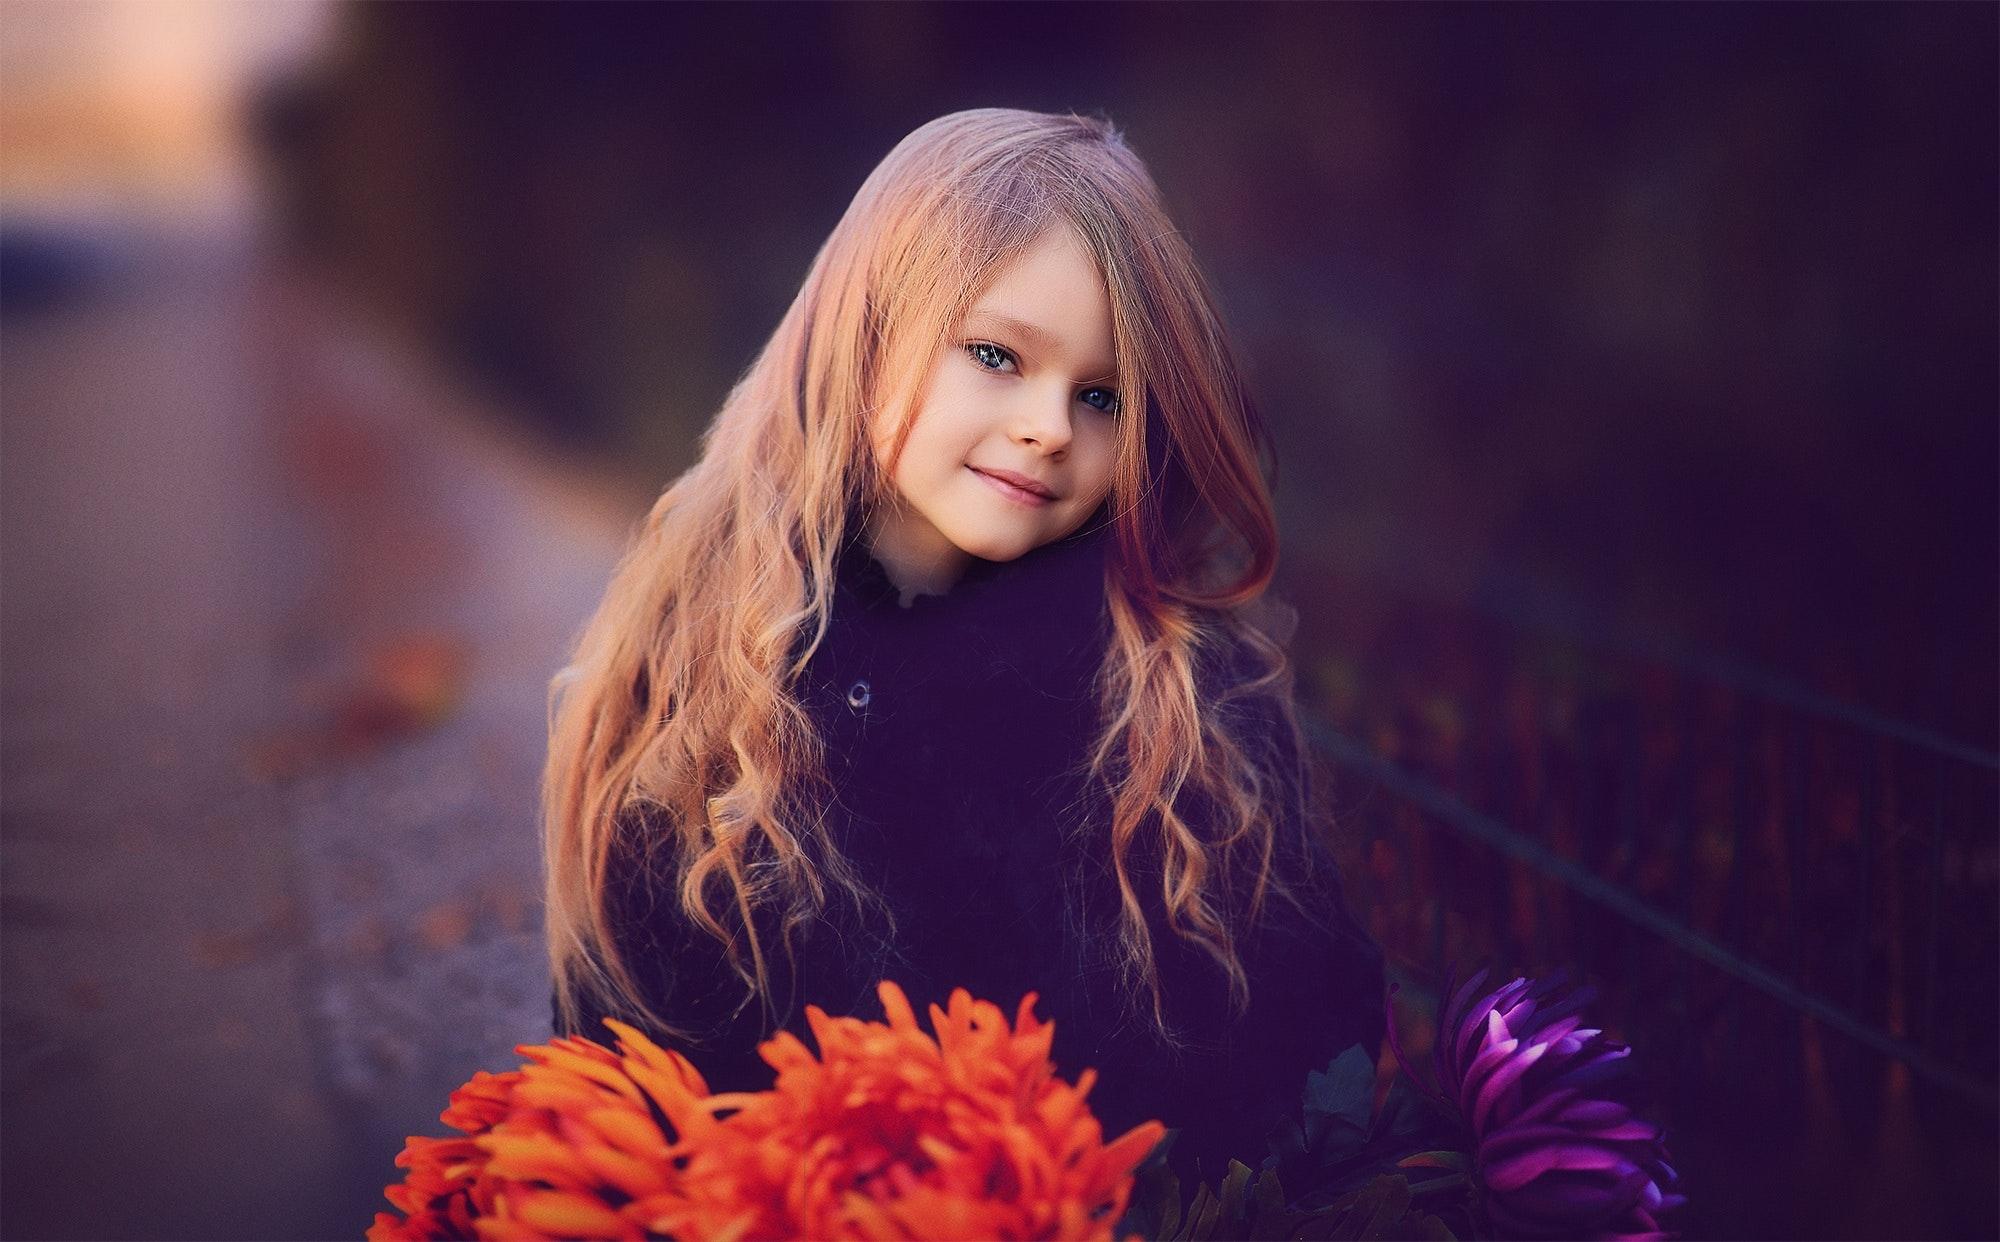 1000+ interesting cute girl photos · pexels · free stock photos